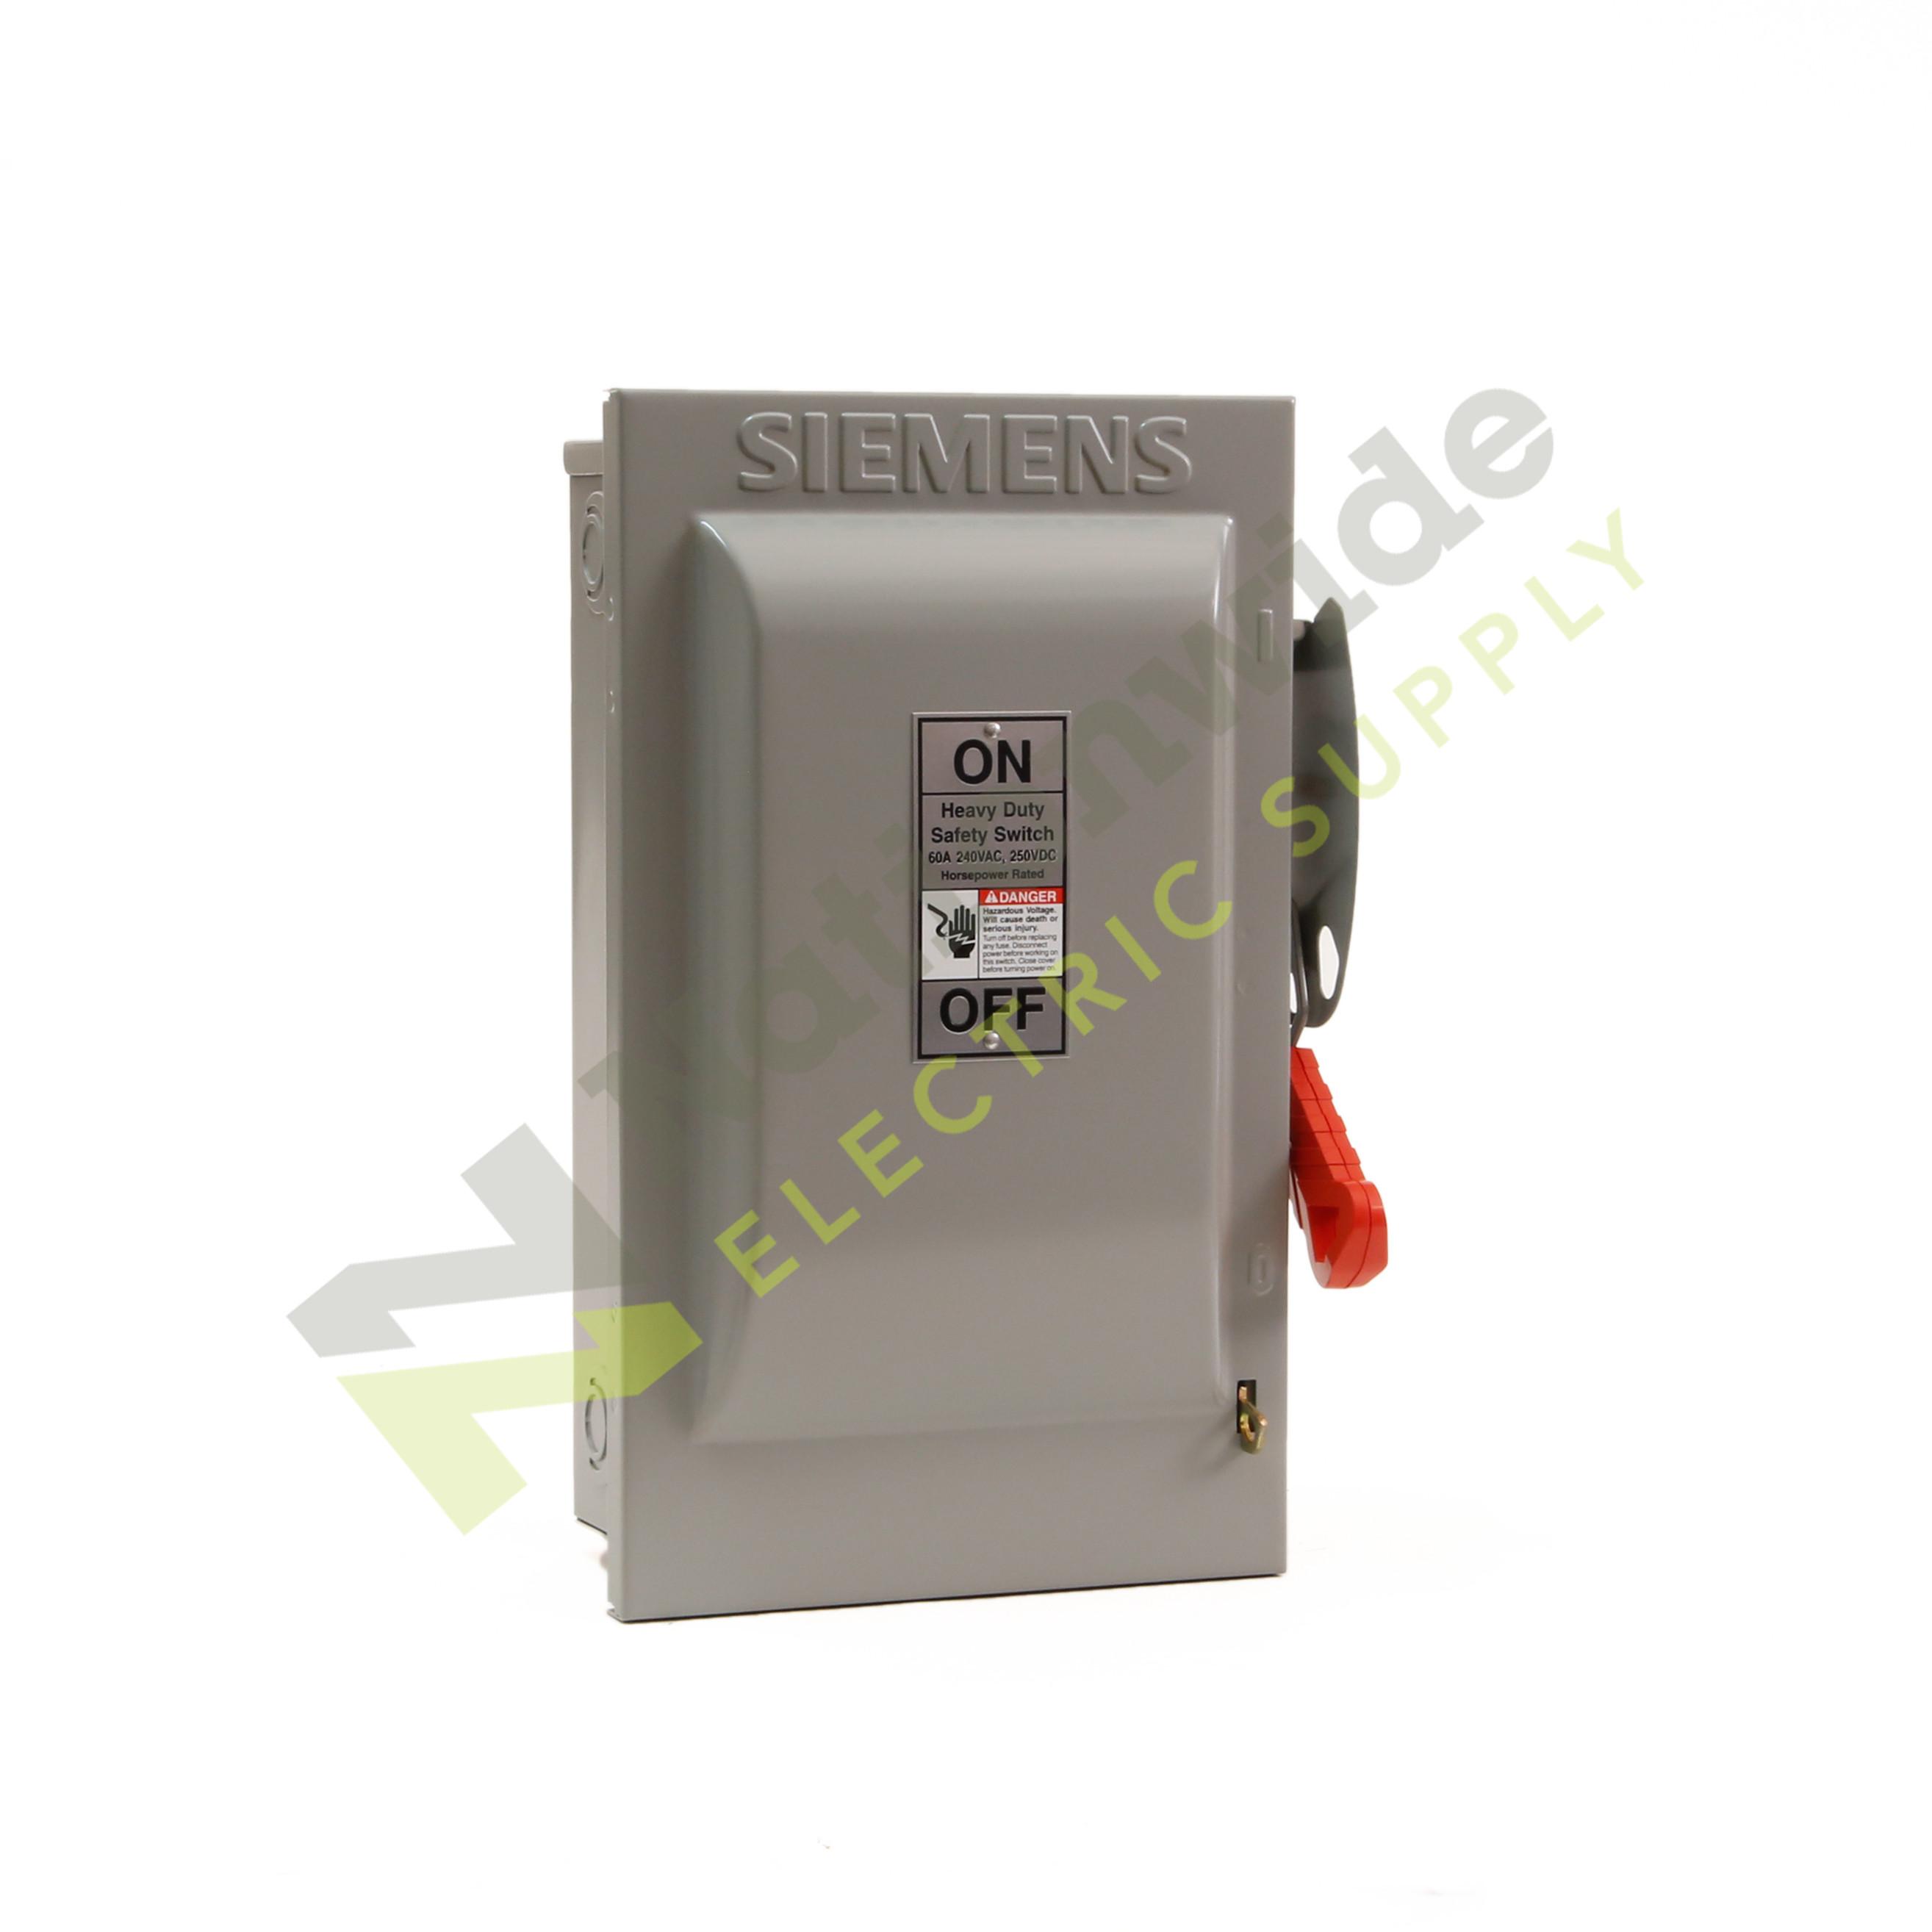 Siemens Disconnect Switches